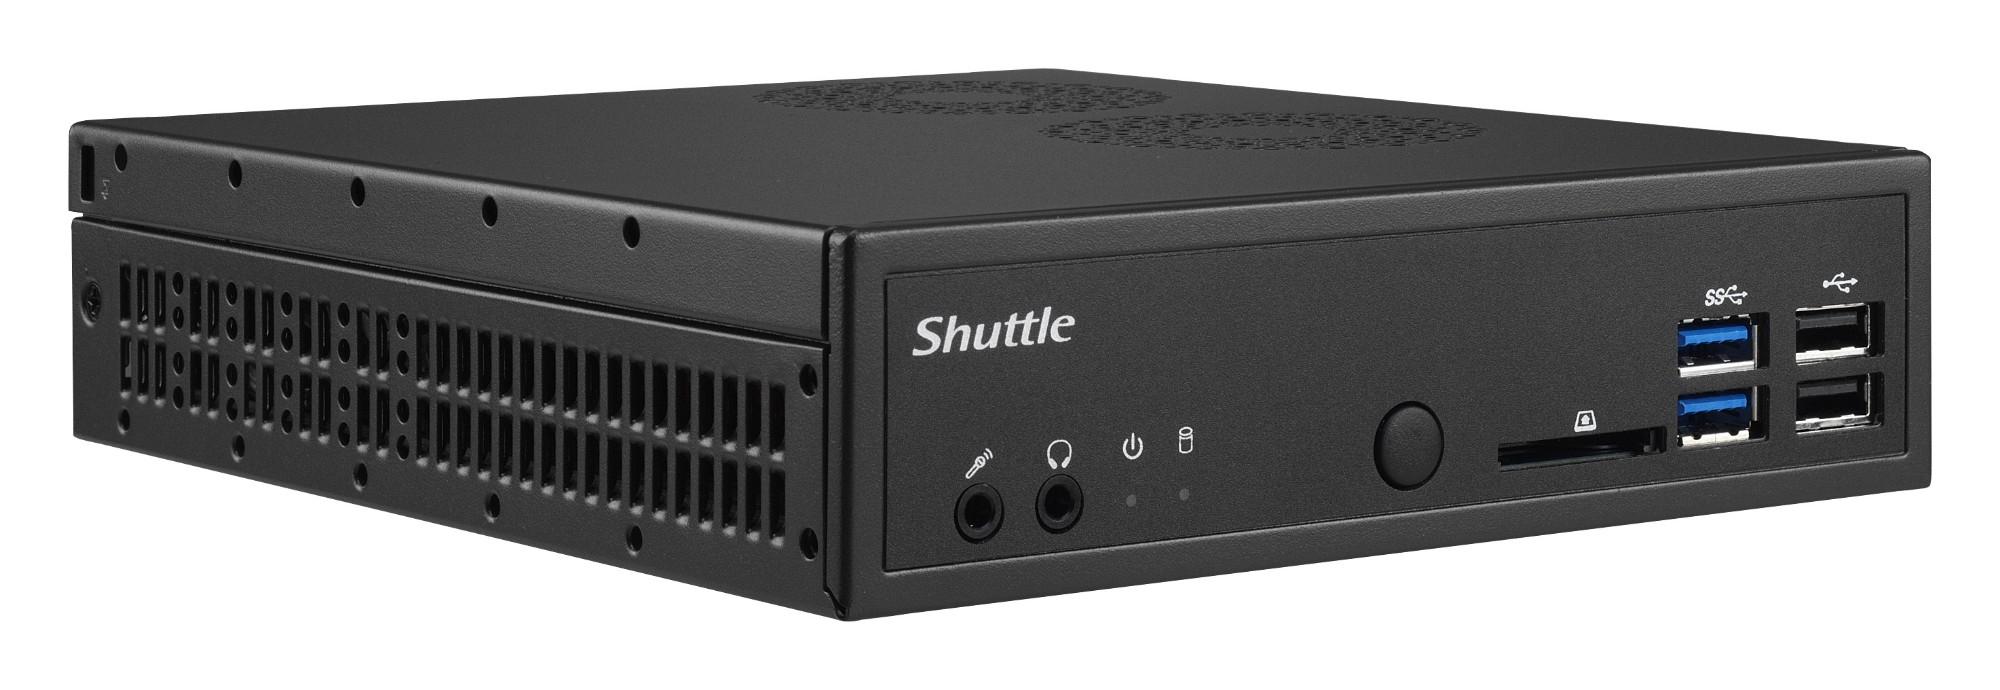 Shuttle DQ170 PC/workstation barebone Nettop Black Intel® Q170 LGA 1151 (Socket H4)